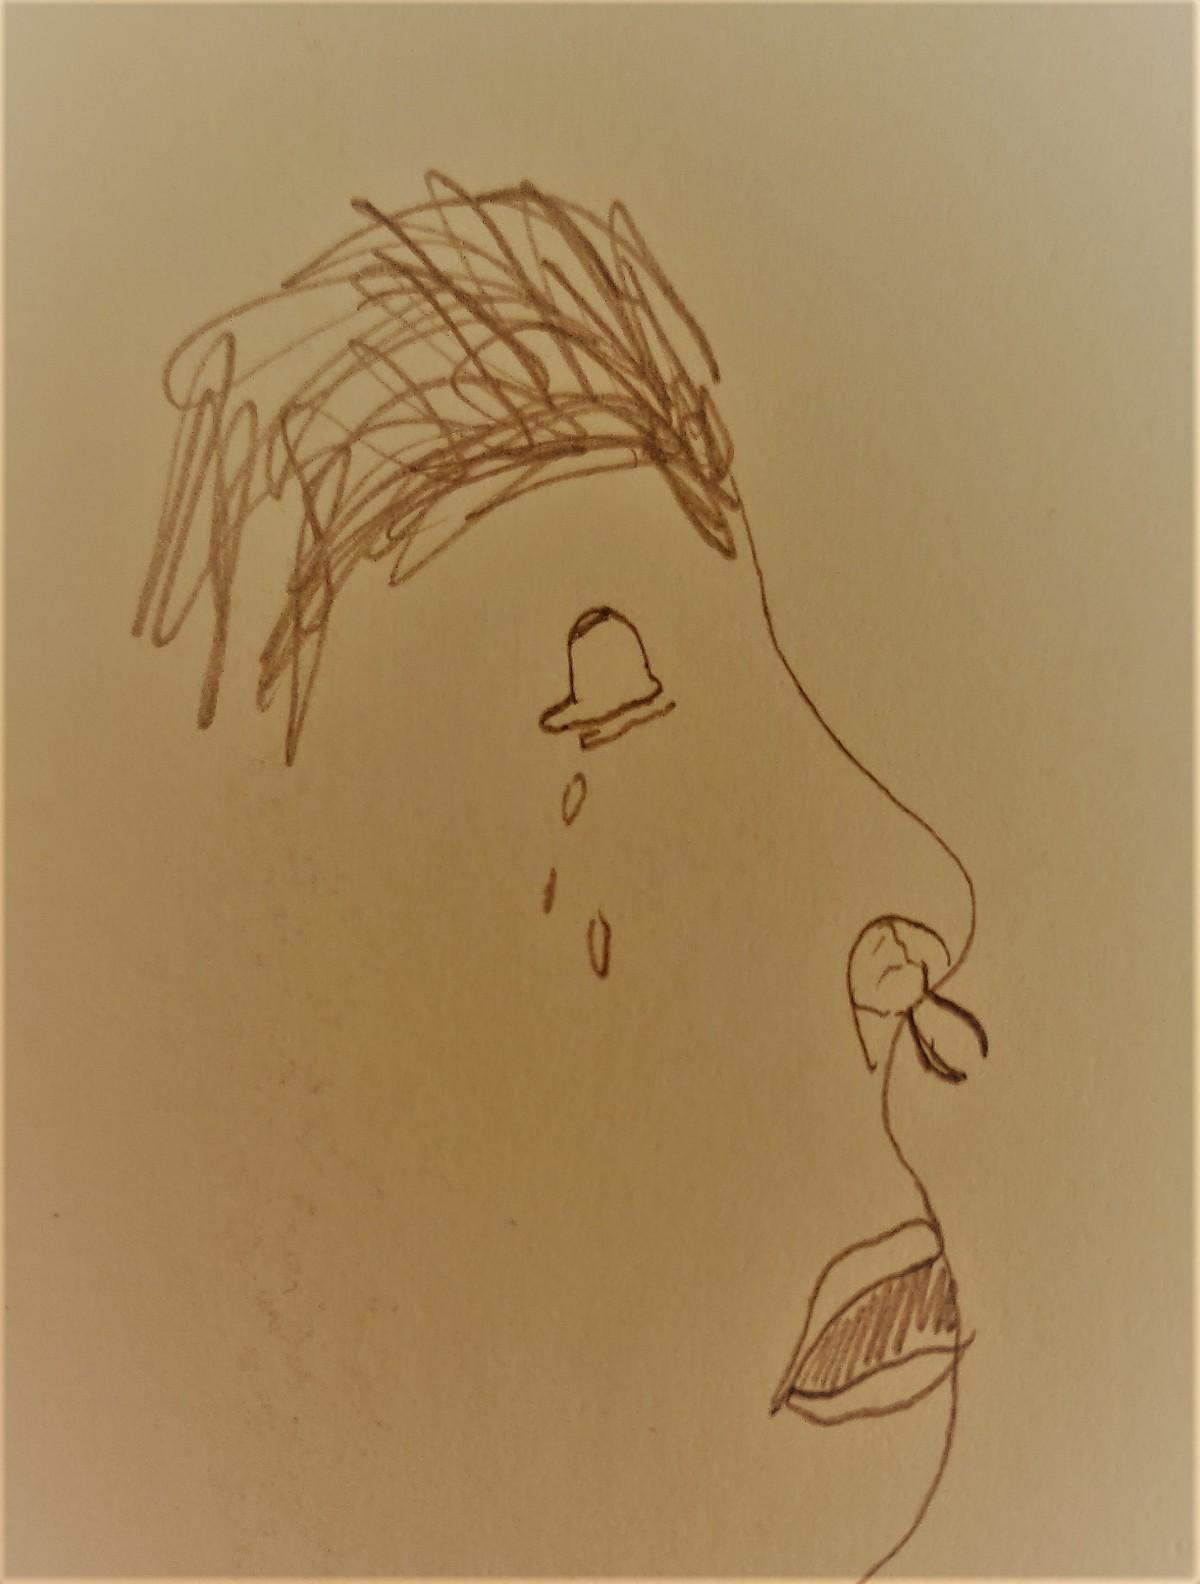 Dreaming of a creepycrawly,